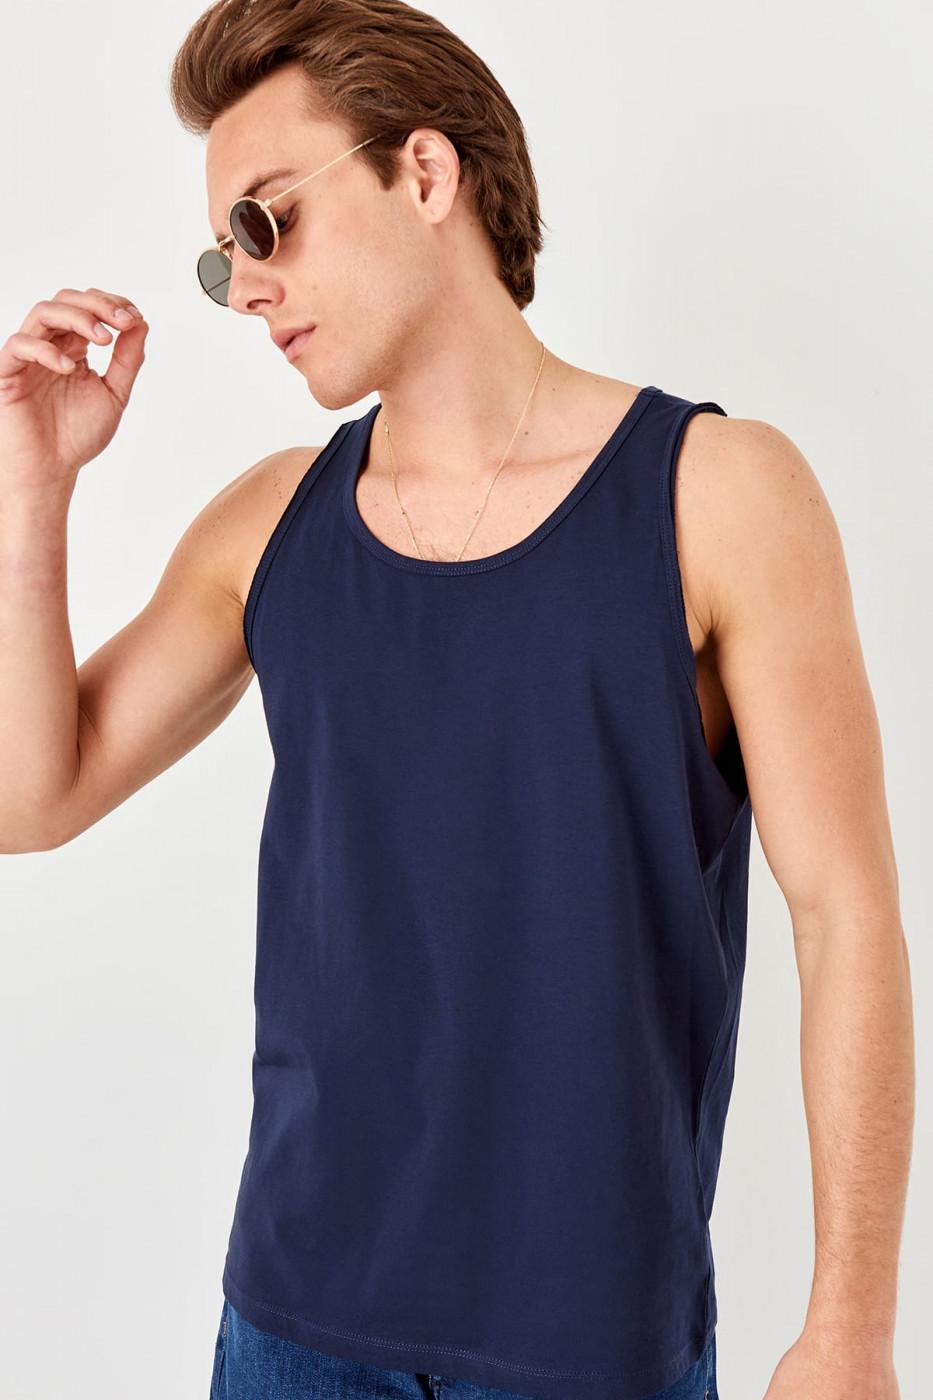 Trendyol Navy blue male filthy collar athlete